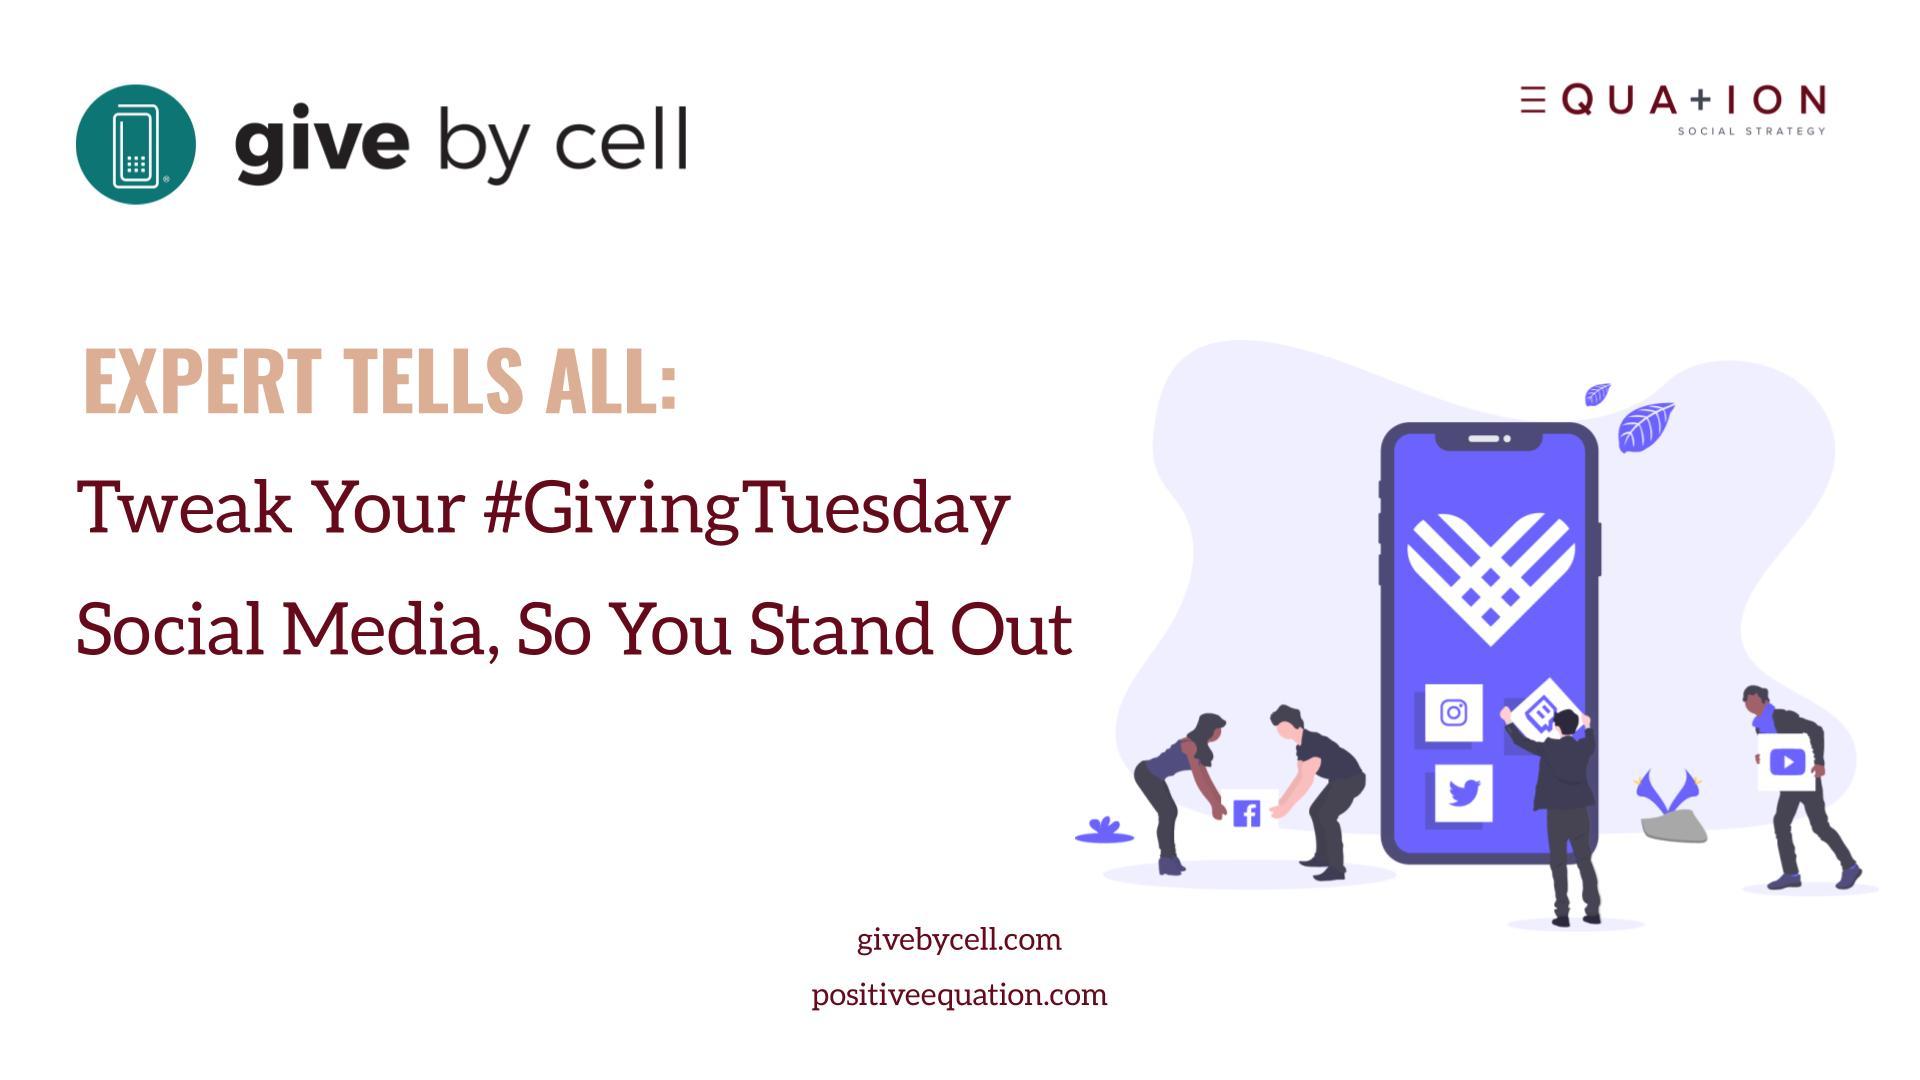 Tweak your #GivingTuesday Social Media Expert Tells All